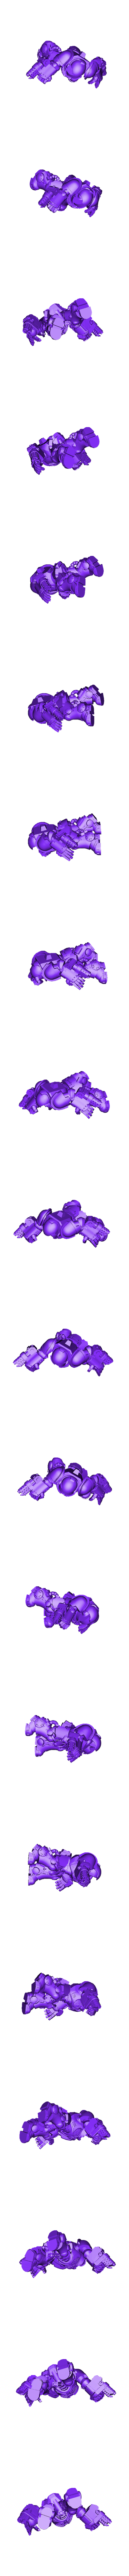 Aggressor_2_Body.stl Download free STL file Flame Armed Instigators • 3D printable template, danny_cyanide